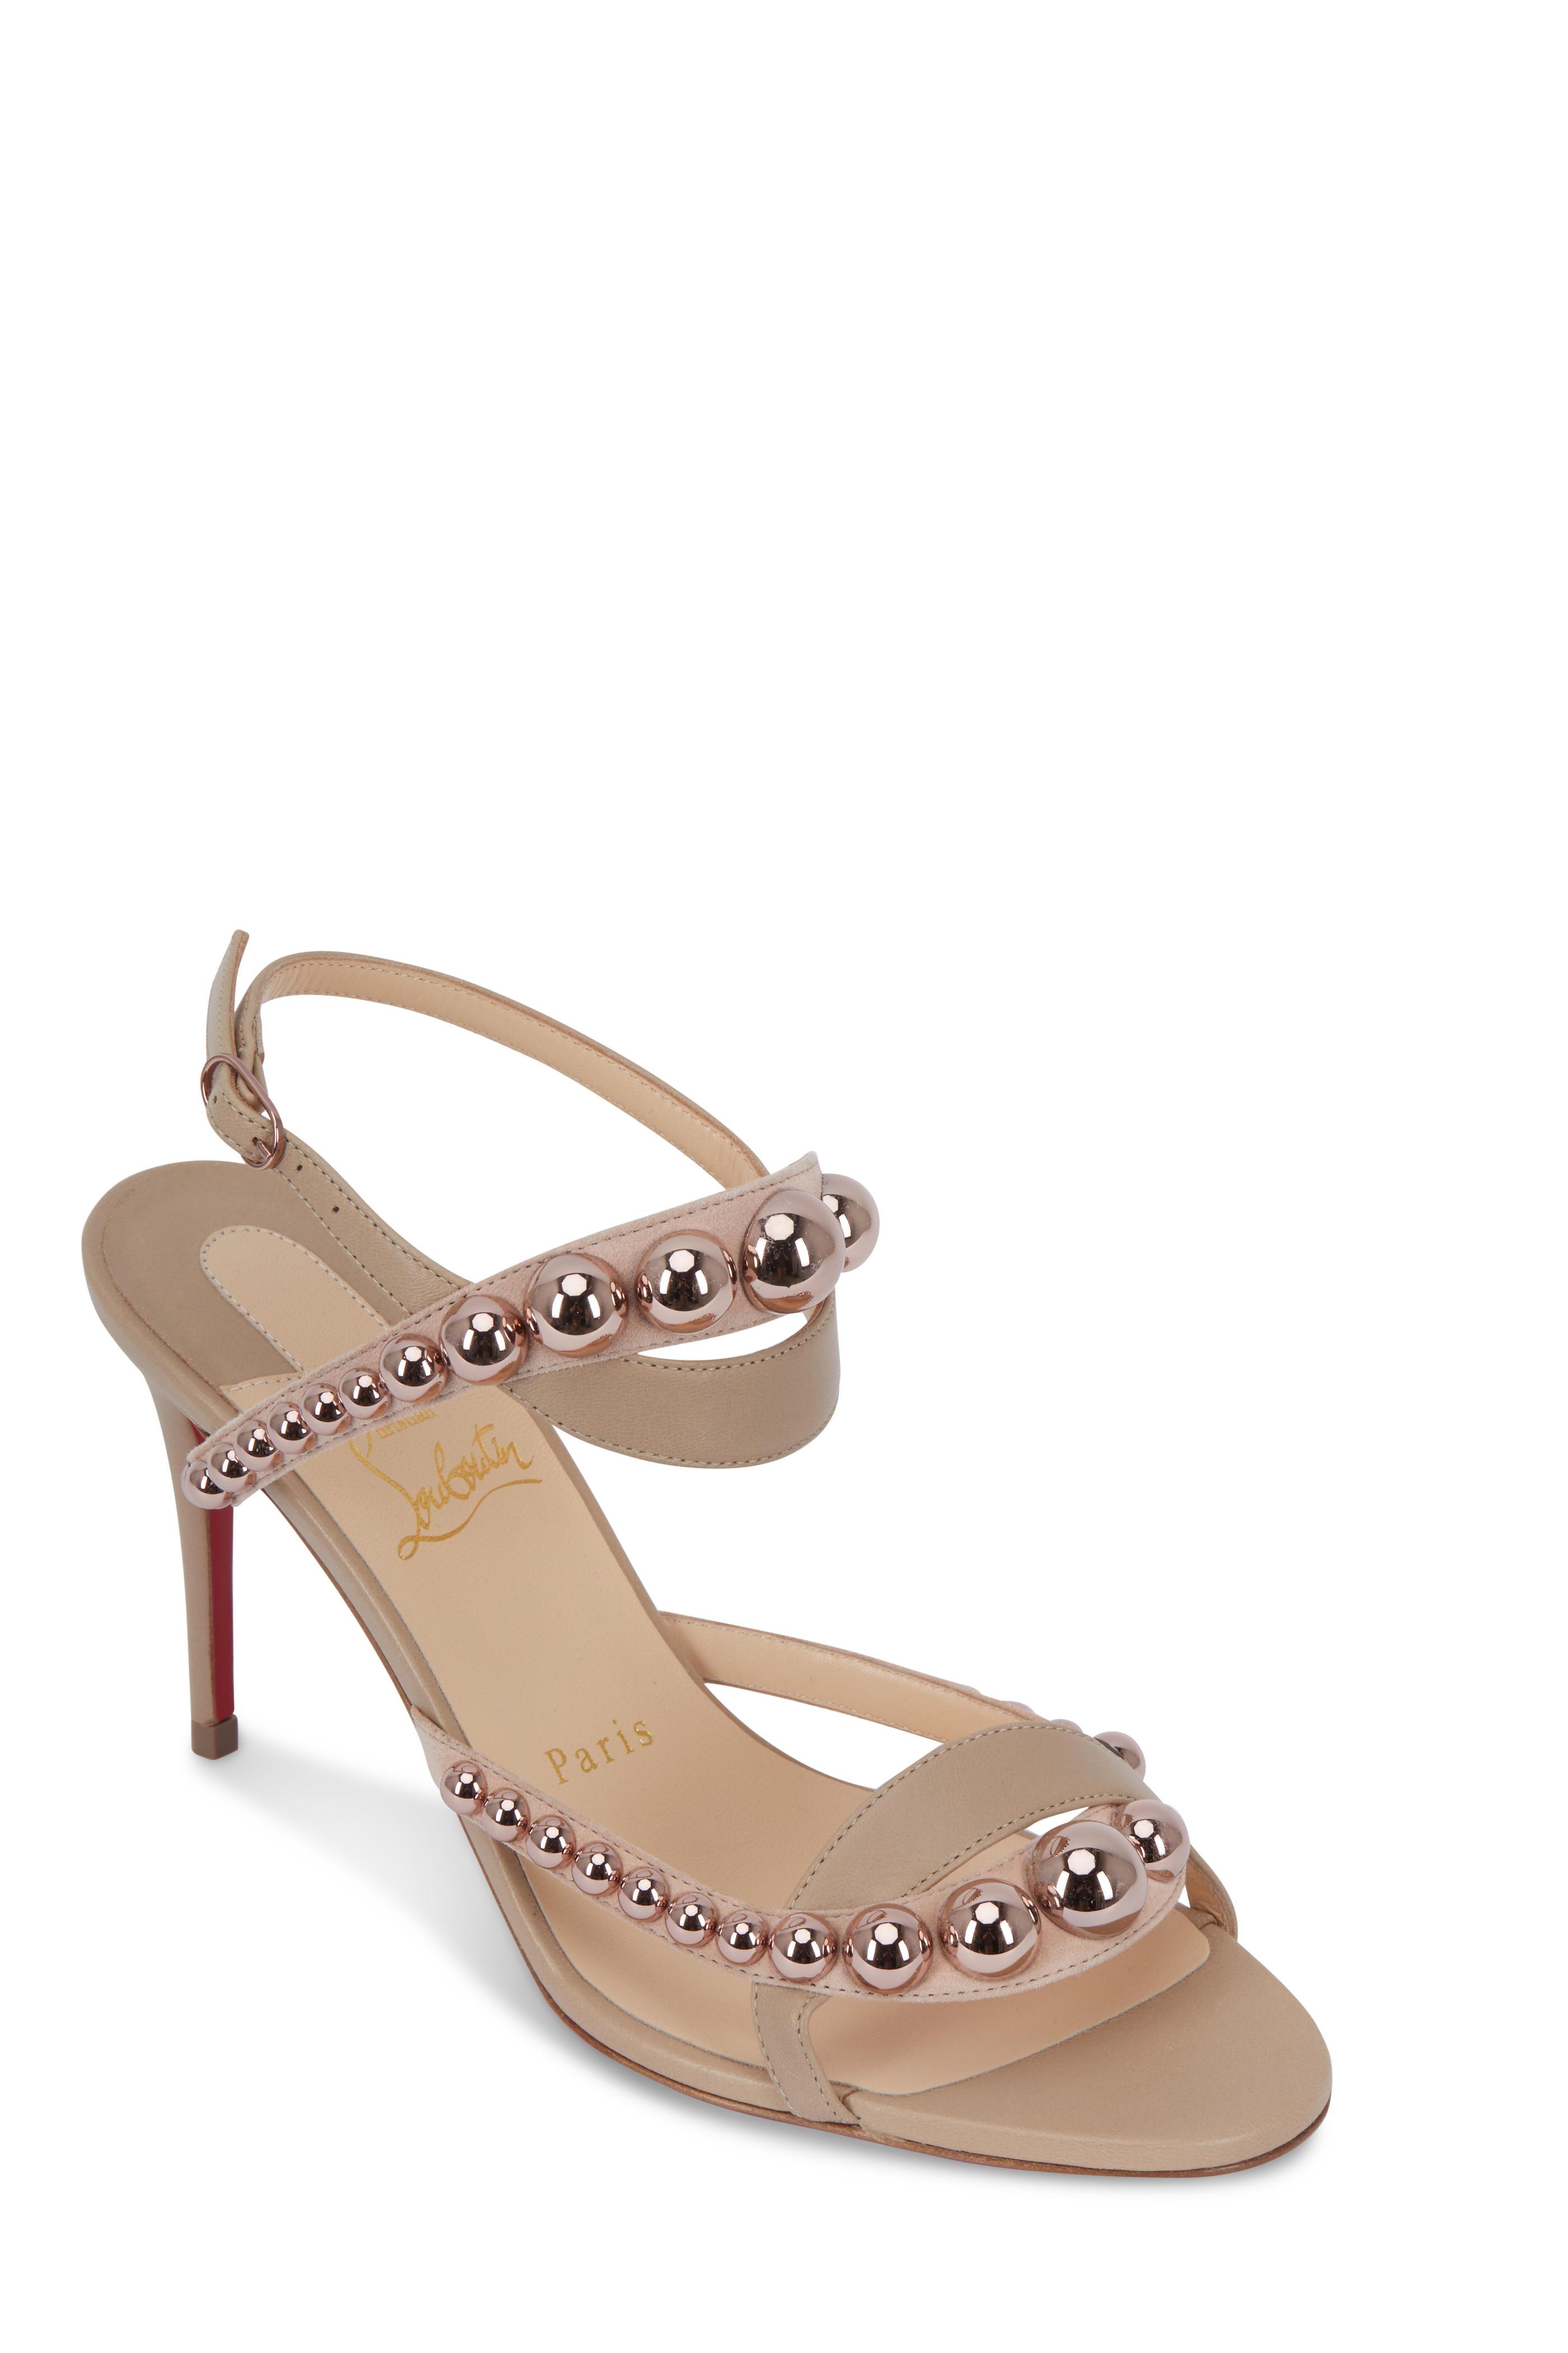 revendeur d2929 cfc94 Christian Louboutin - Galeria Nude & Bronze Rose Stud Sandal ...